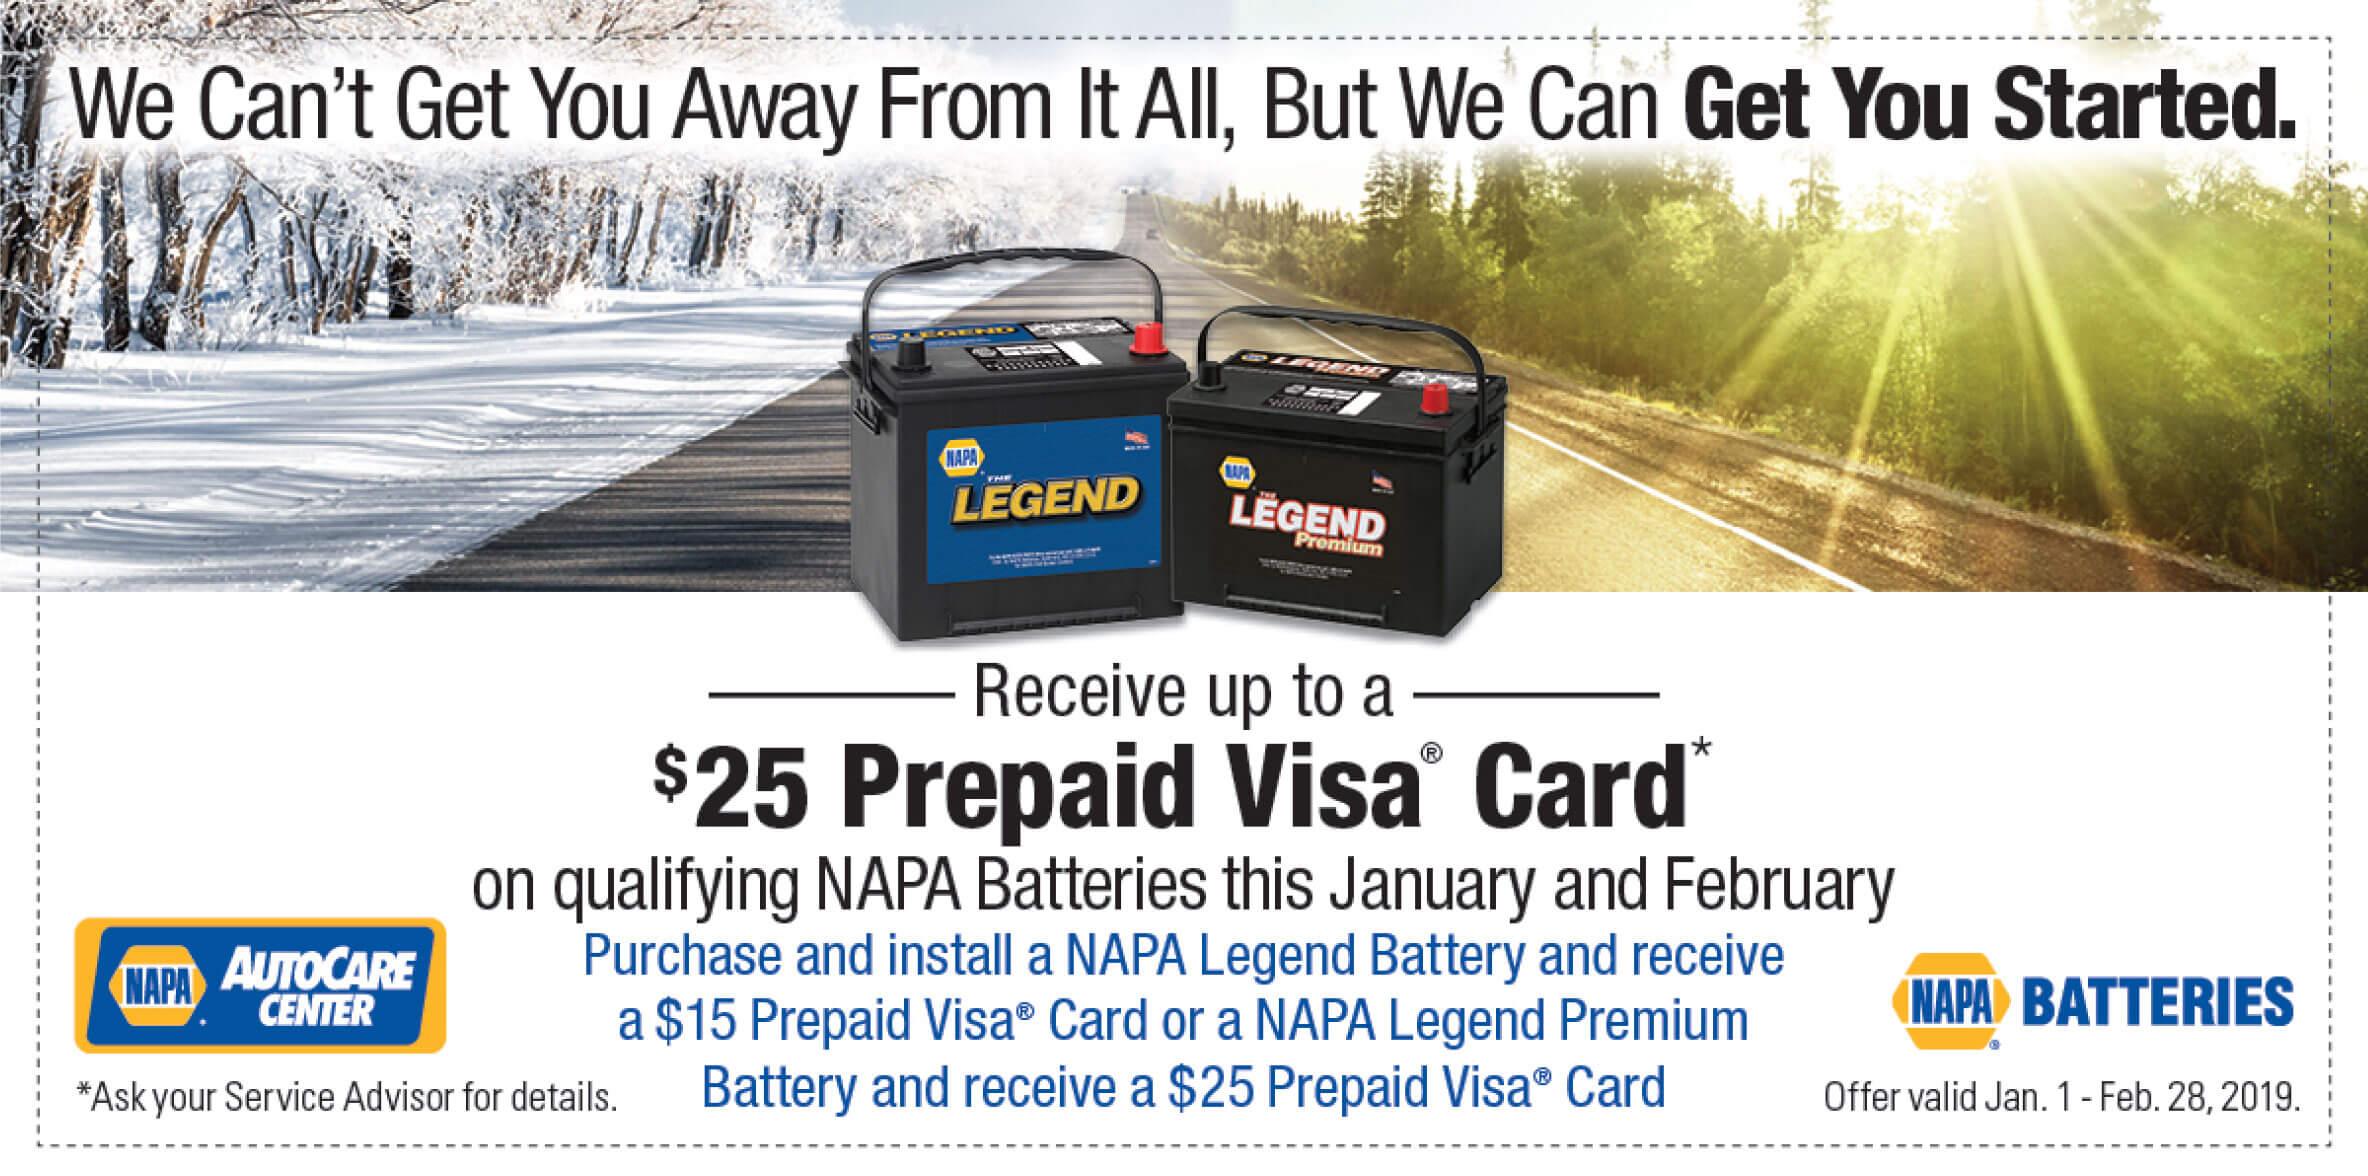 napa batteries special